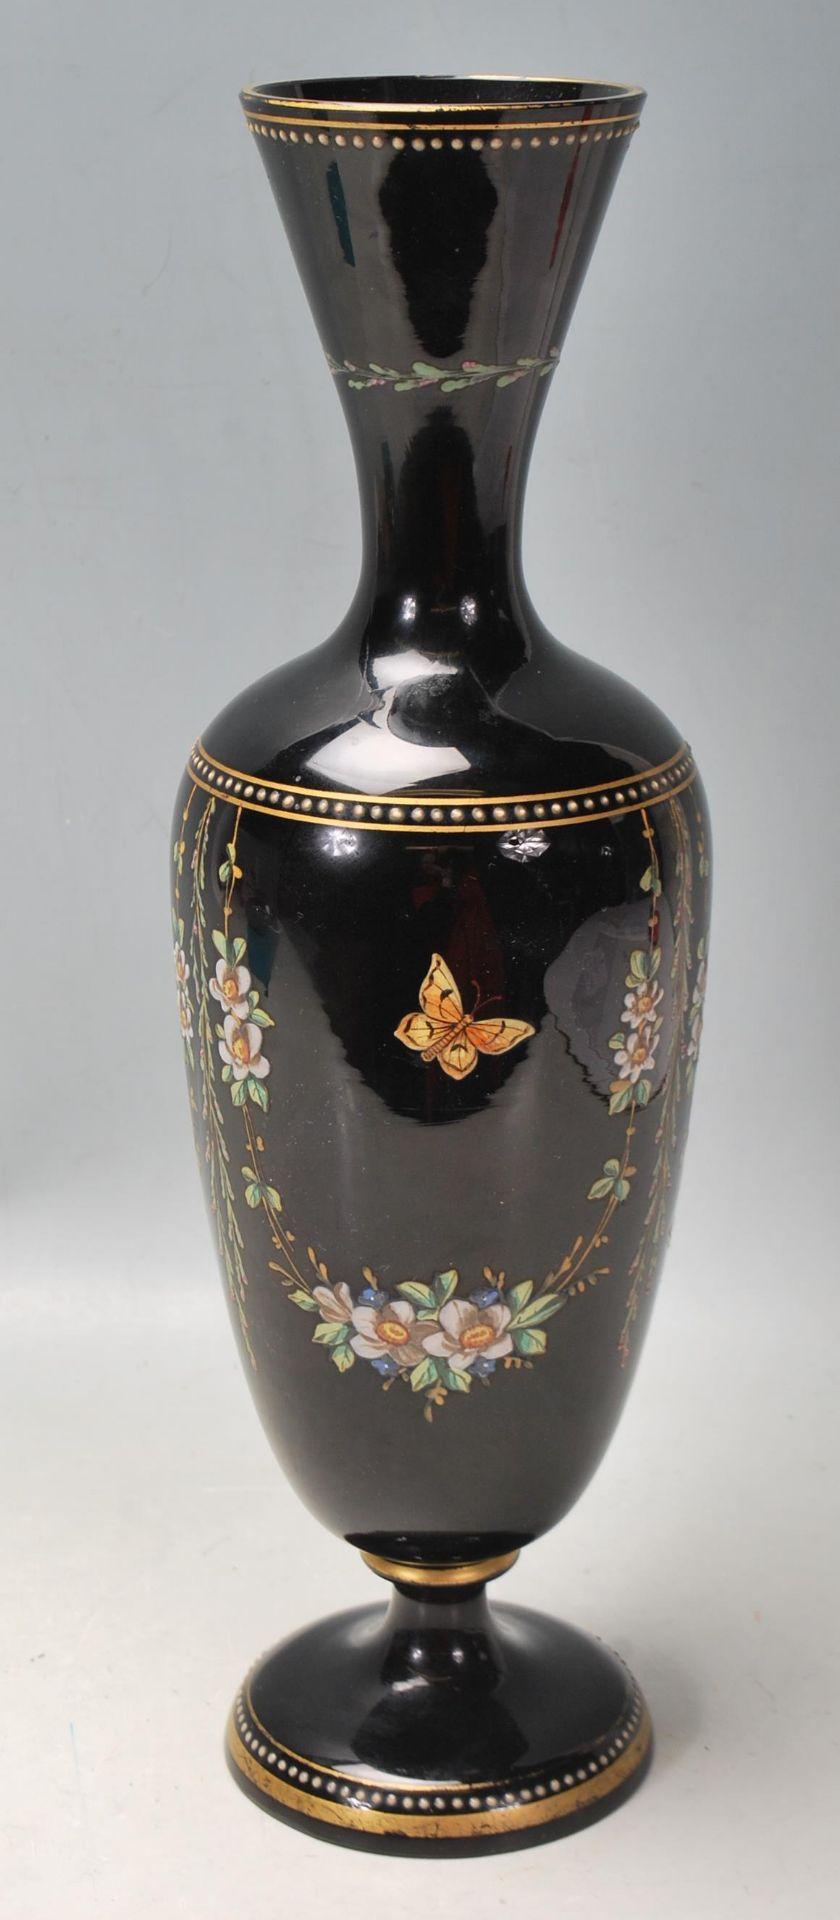 ANTIQUE BLACK AMETHYST BOHEMIAN GLASS VASE